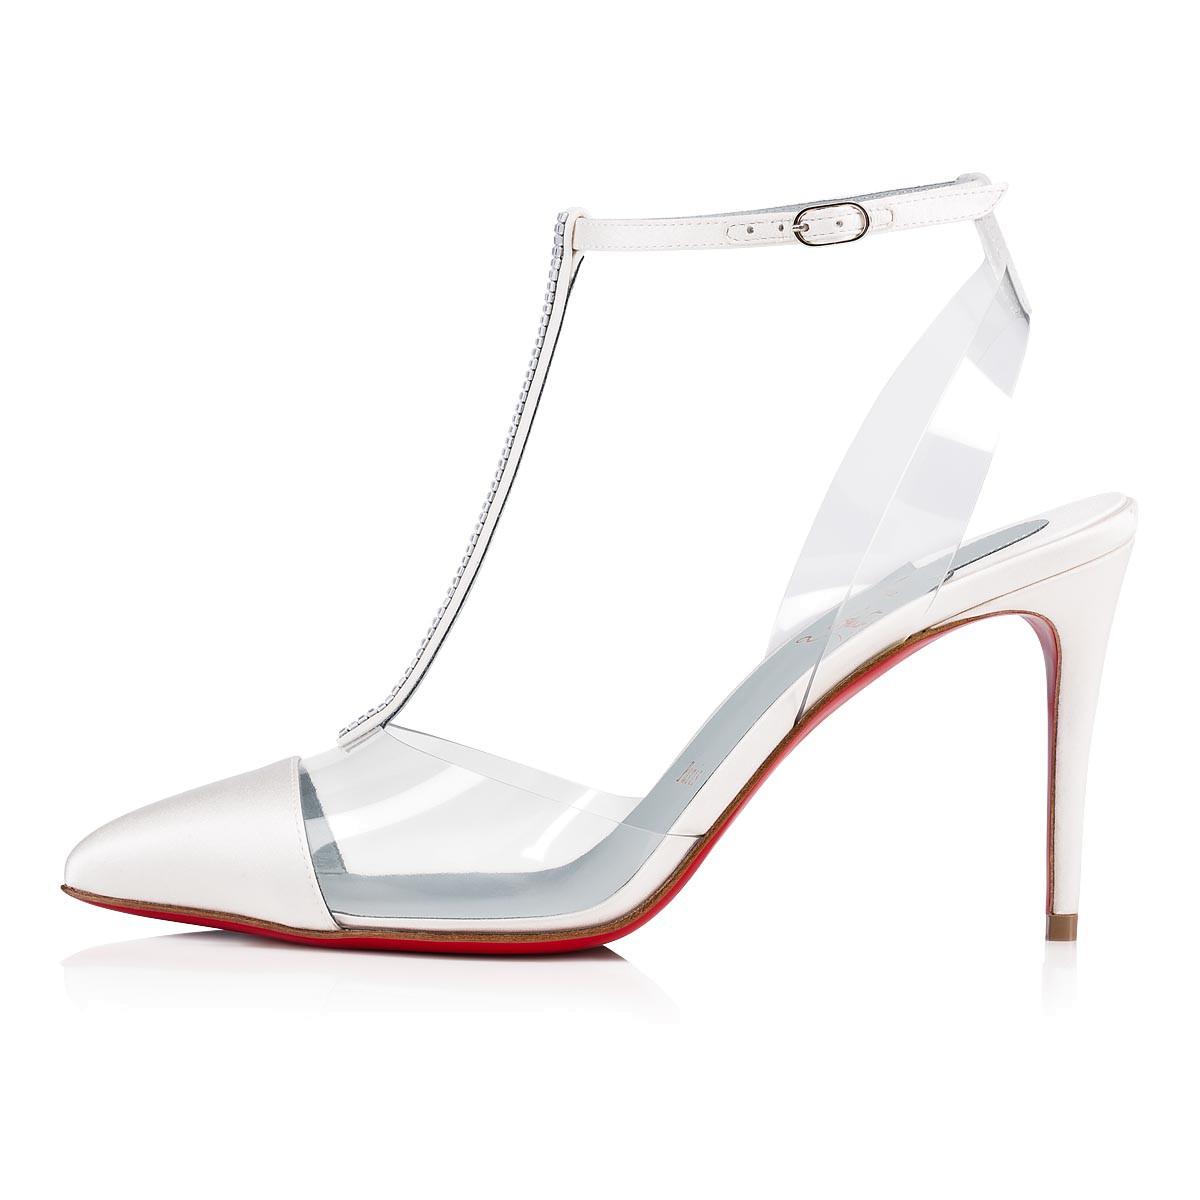 鞋履 - Nosy Strass 085 Strass - Christian Louboutin